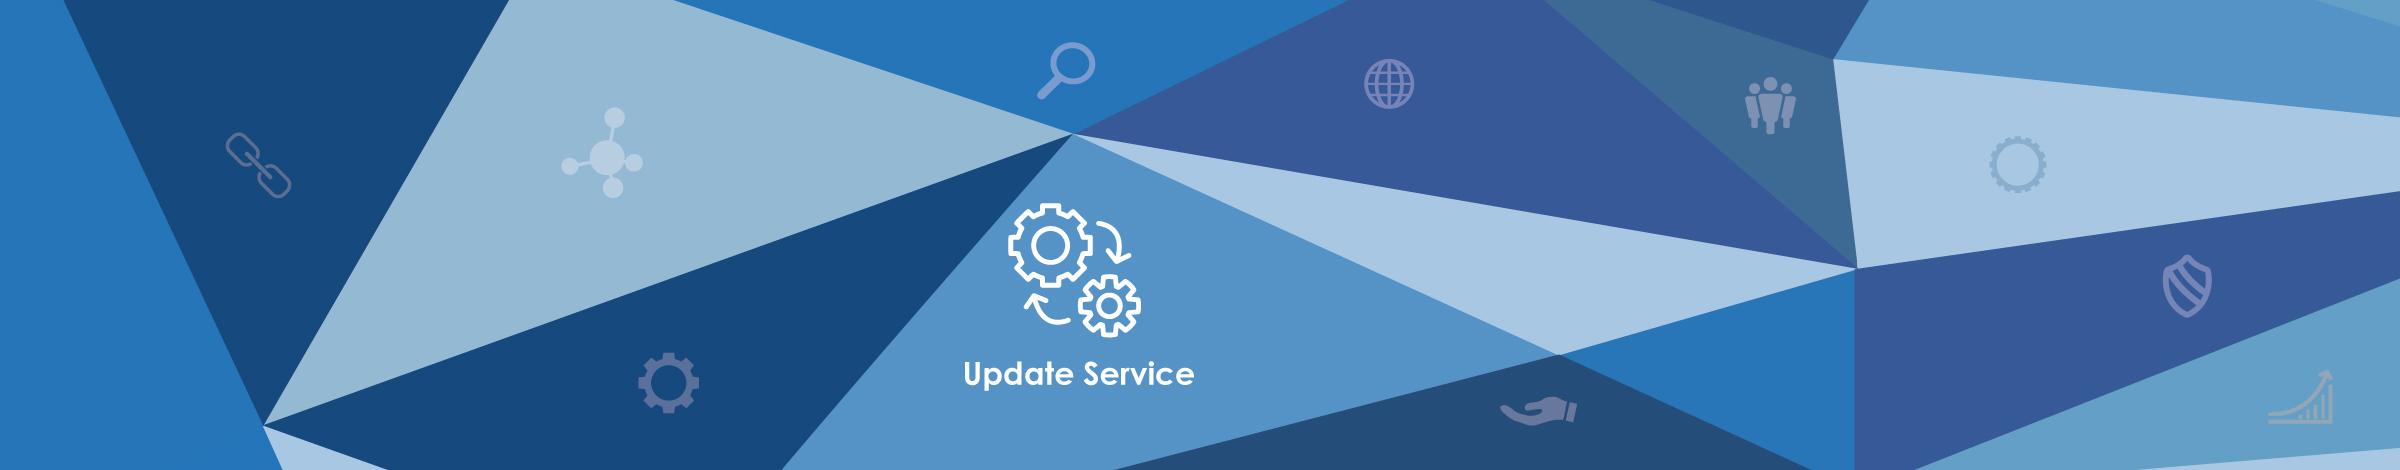 web updates kmu GmbH-wuk-WordPress und SEO Agentur - Update Service